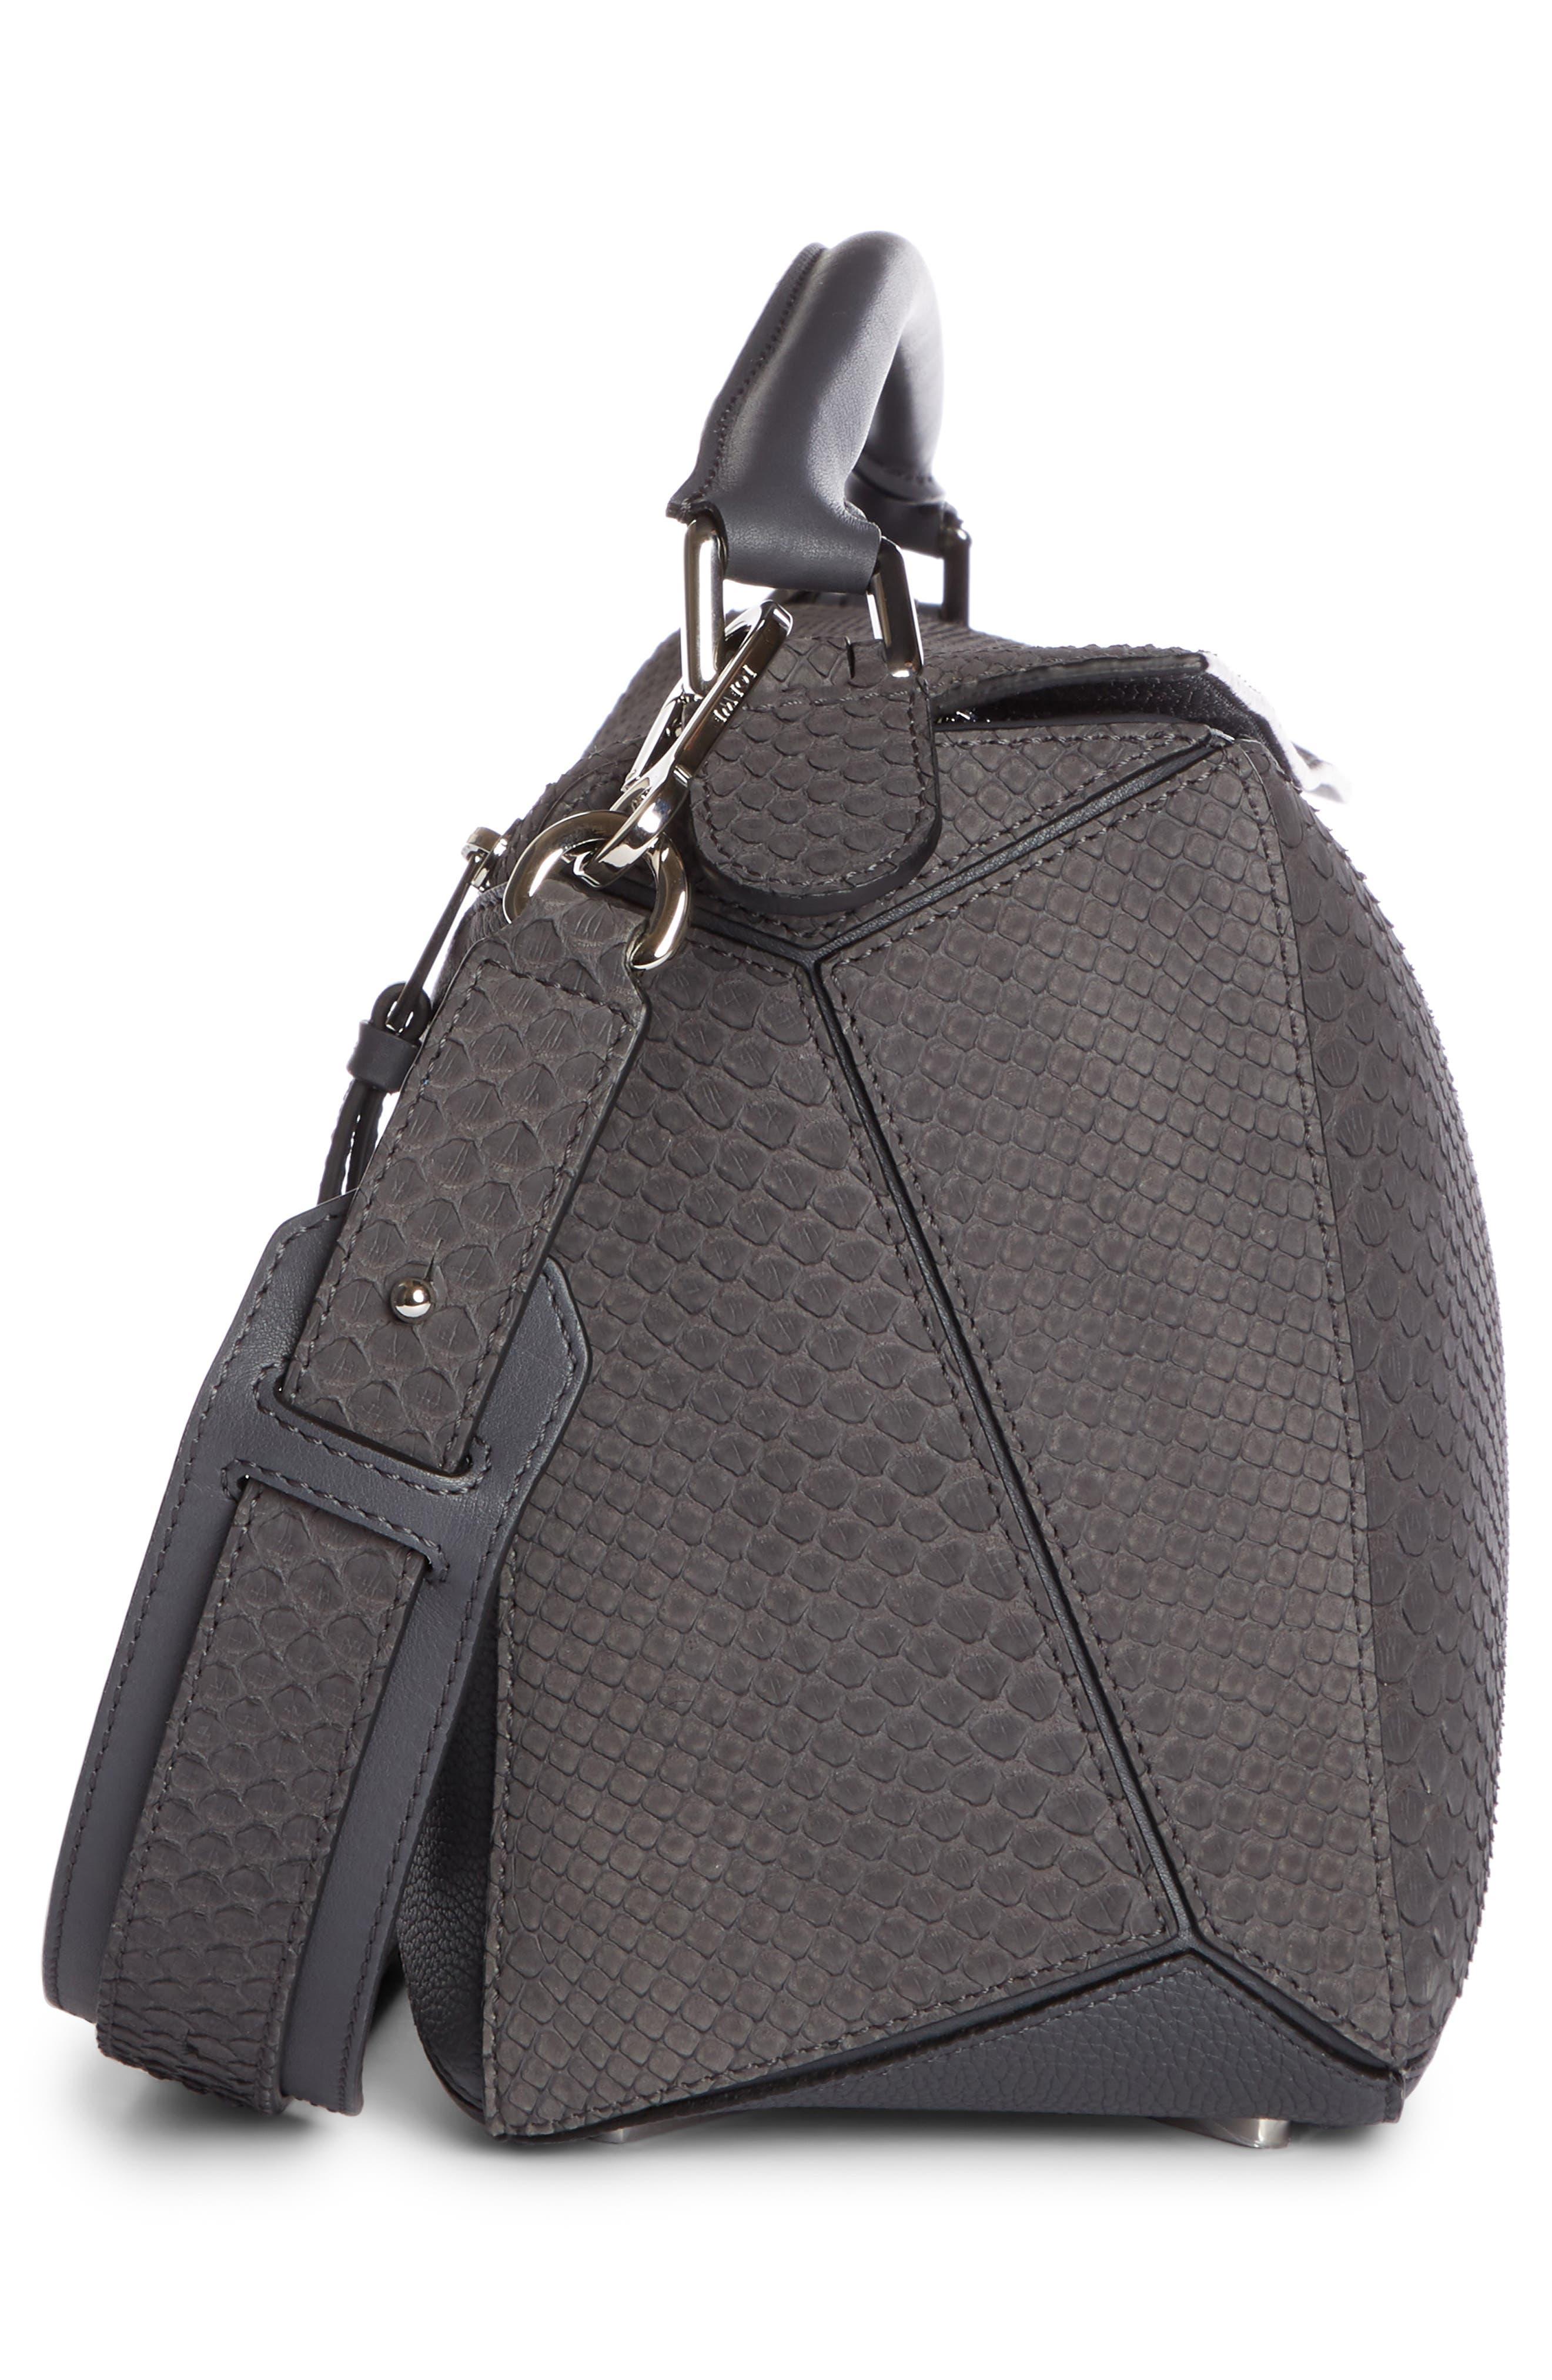 Medium Puzzle Leather Shoulder Bag,                             Alternate thumbnail 3, color,                             ANTHRACITE